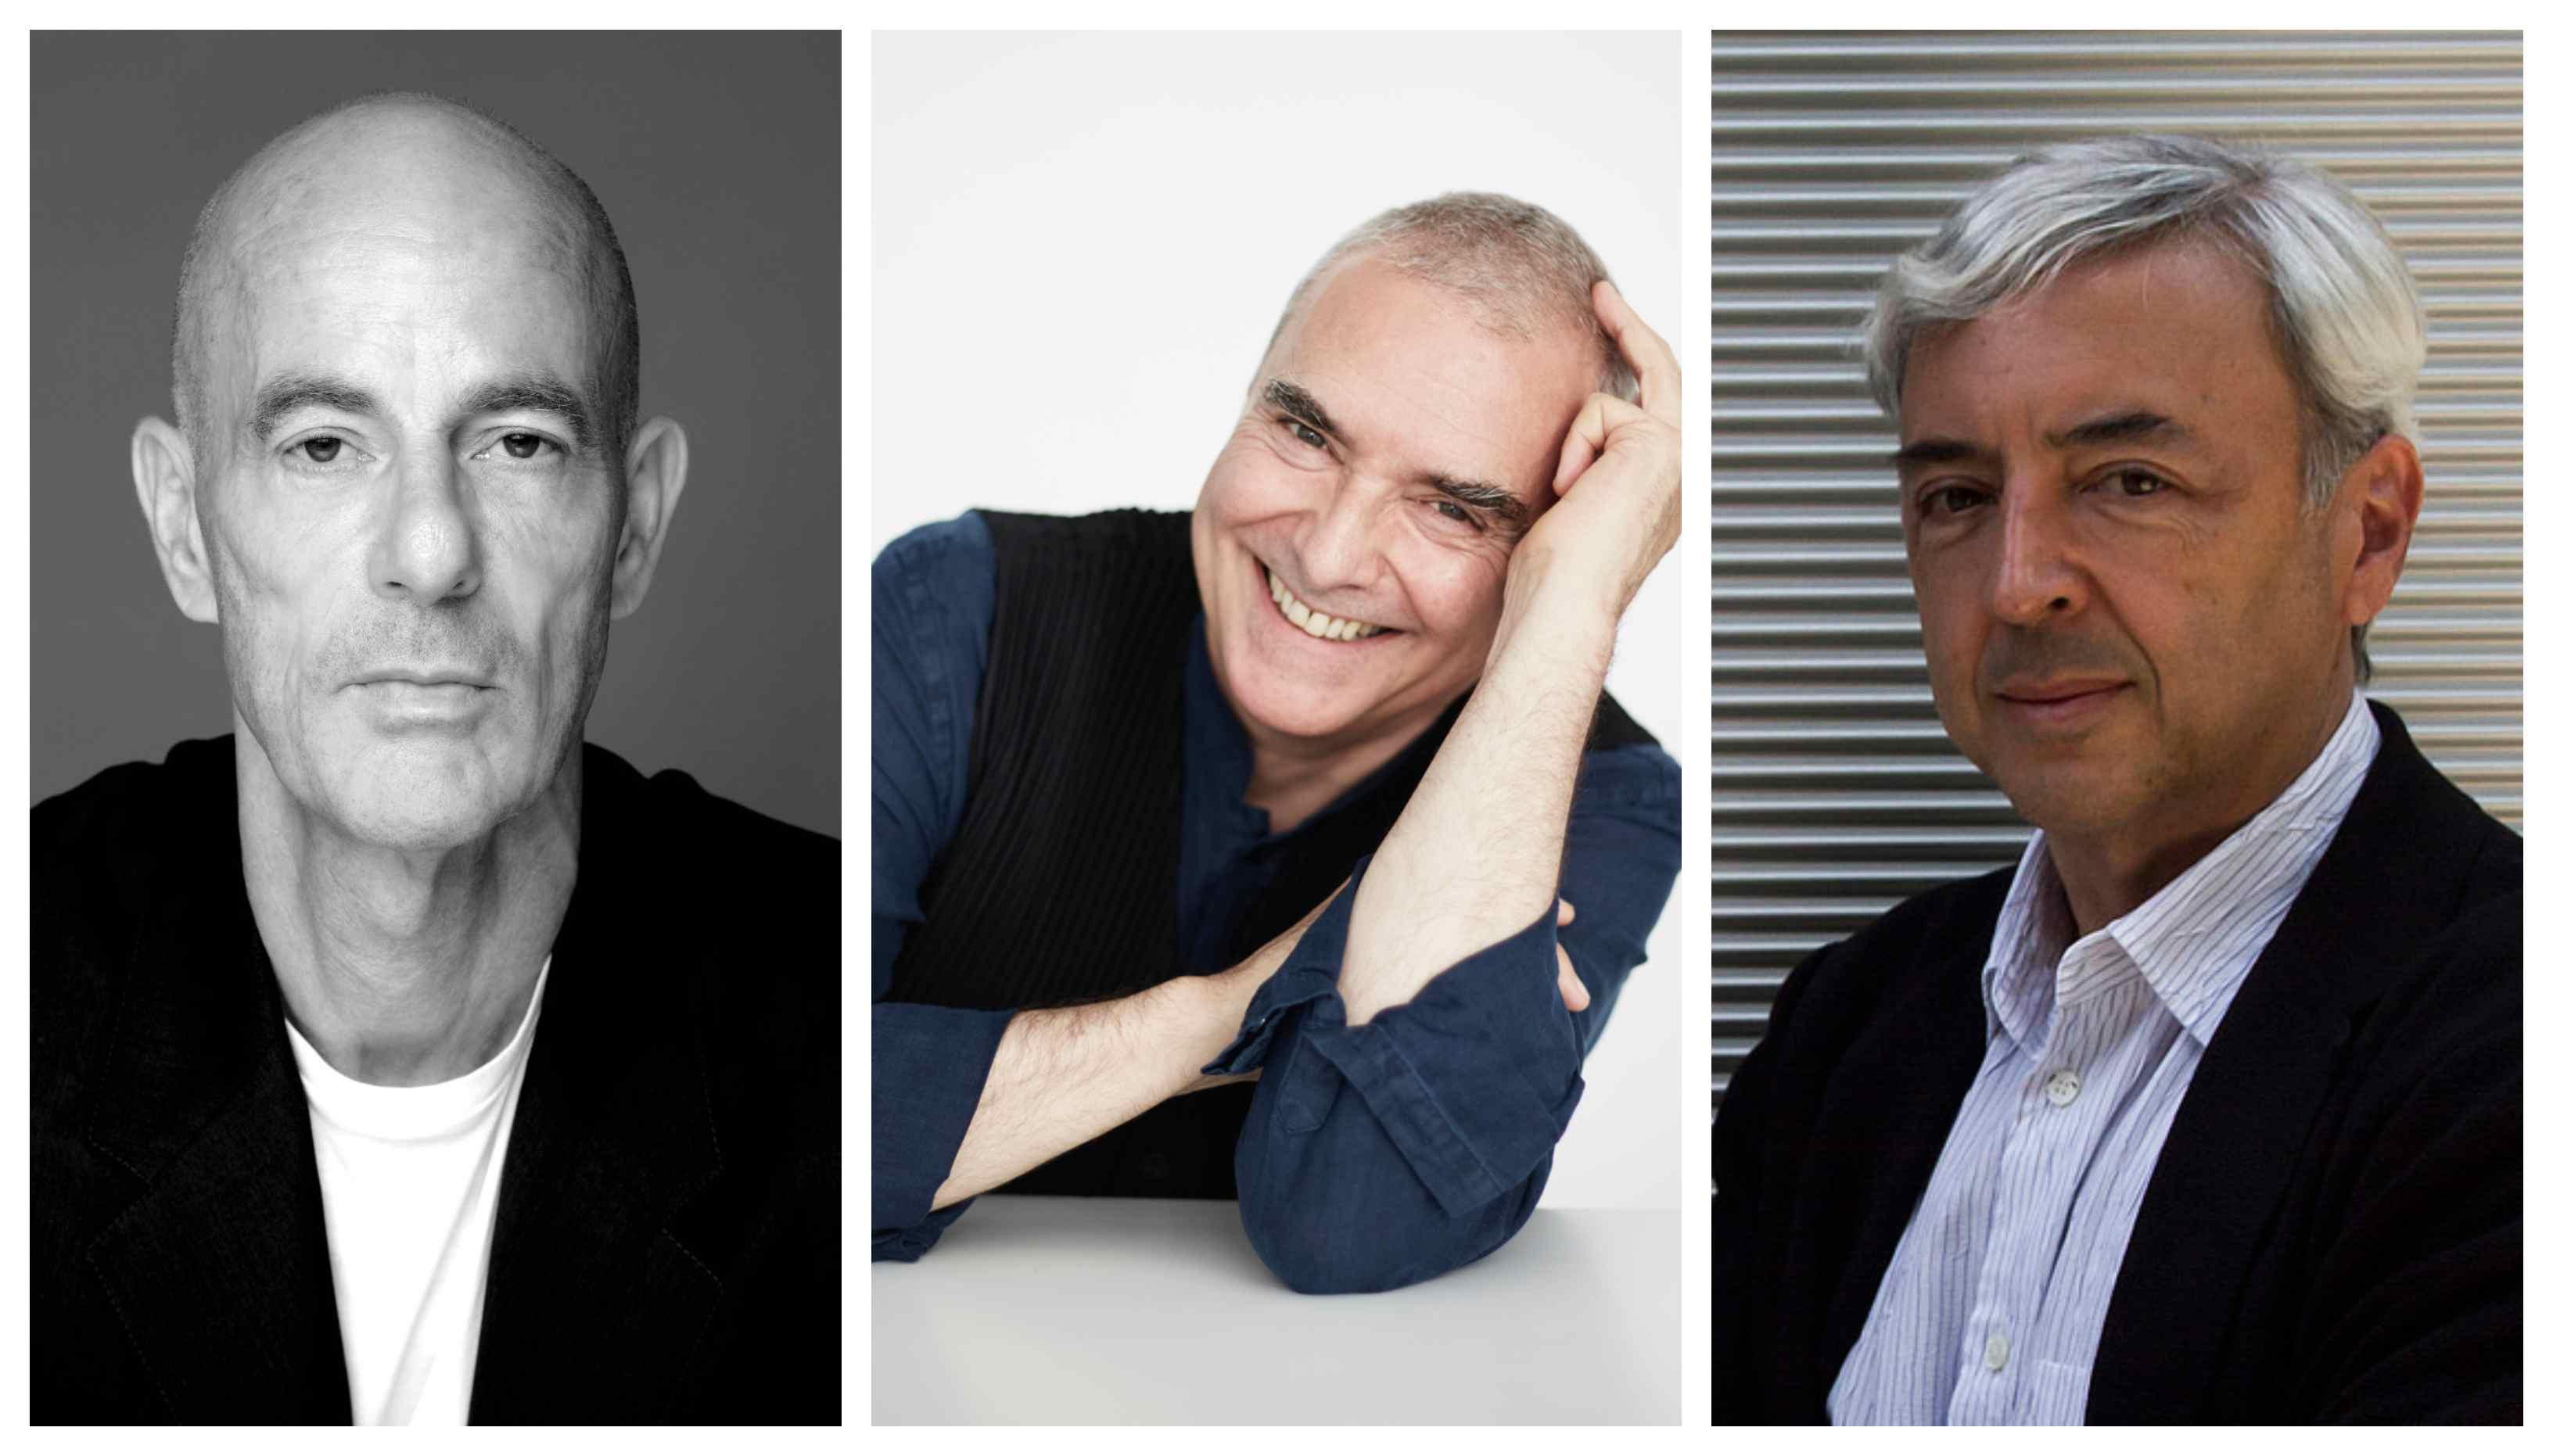 Jacques Herzog, Dominique Perrault, Enrique Sobejano. Foro de Arquitectura Cevisama 2019